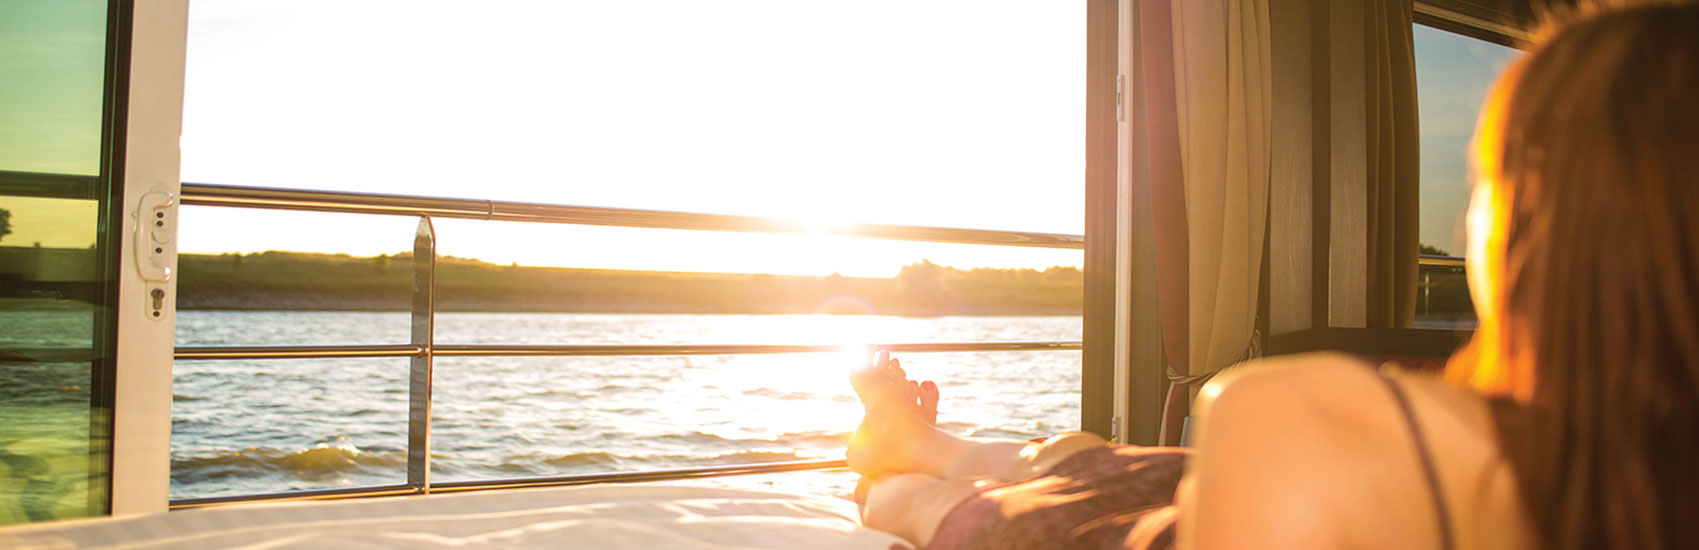 Suite Upgrades on Europe 2021 Avalon Waterways Voyages 0